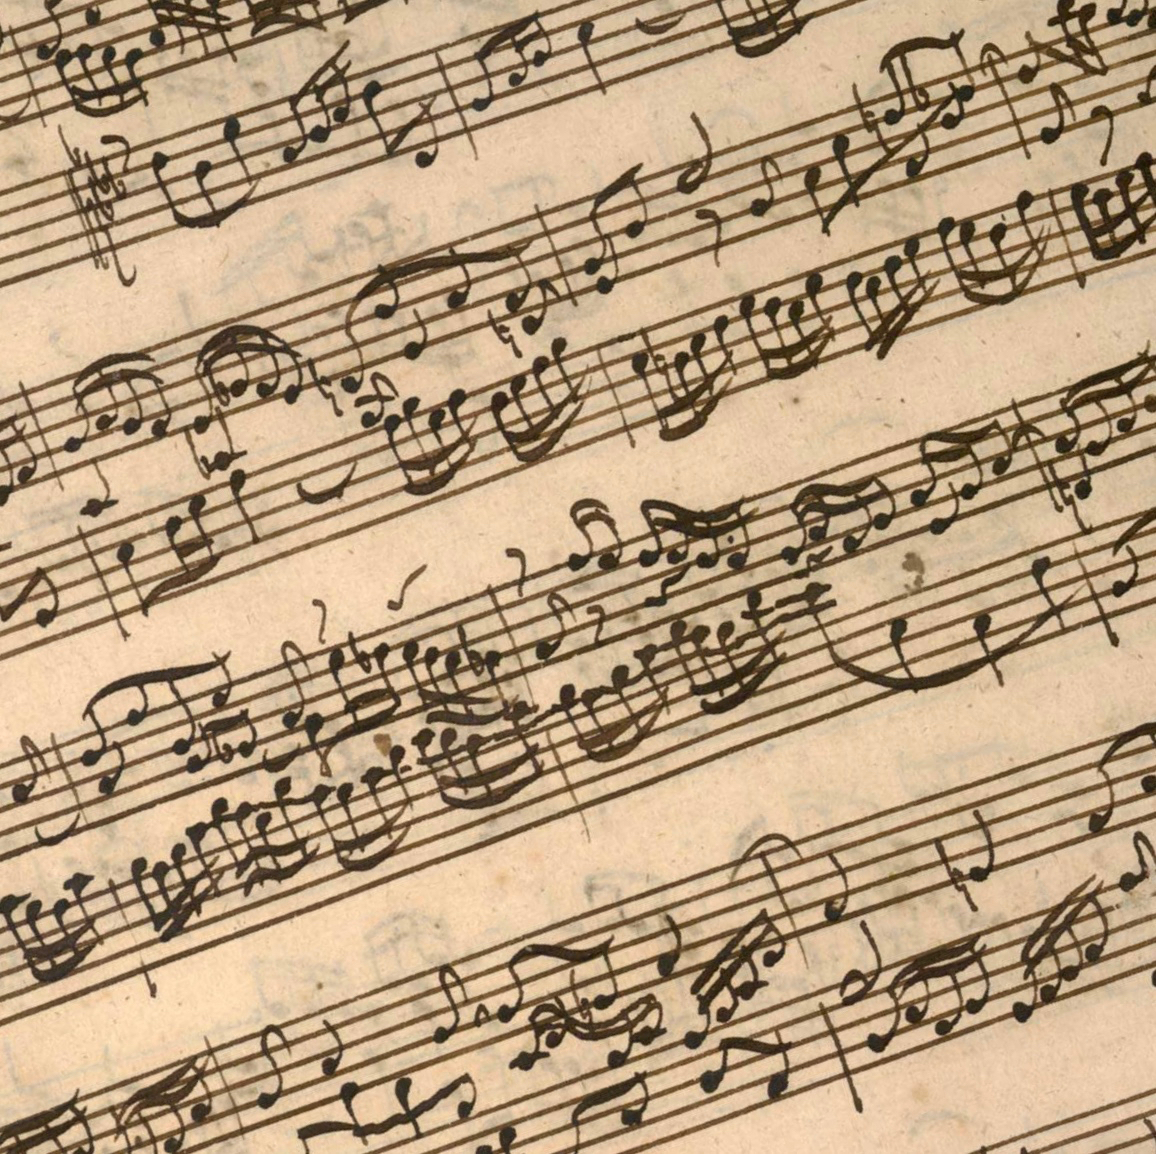 Arrangements - Classic music, a fresh sound